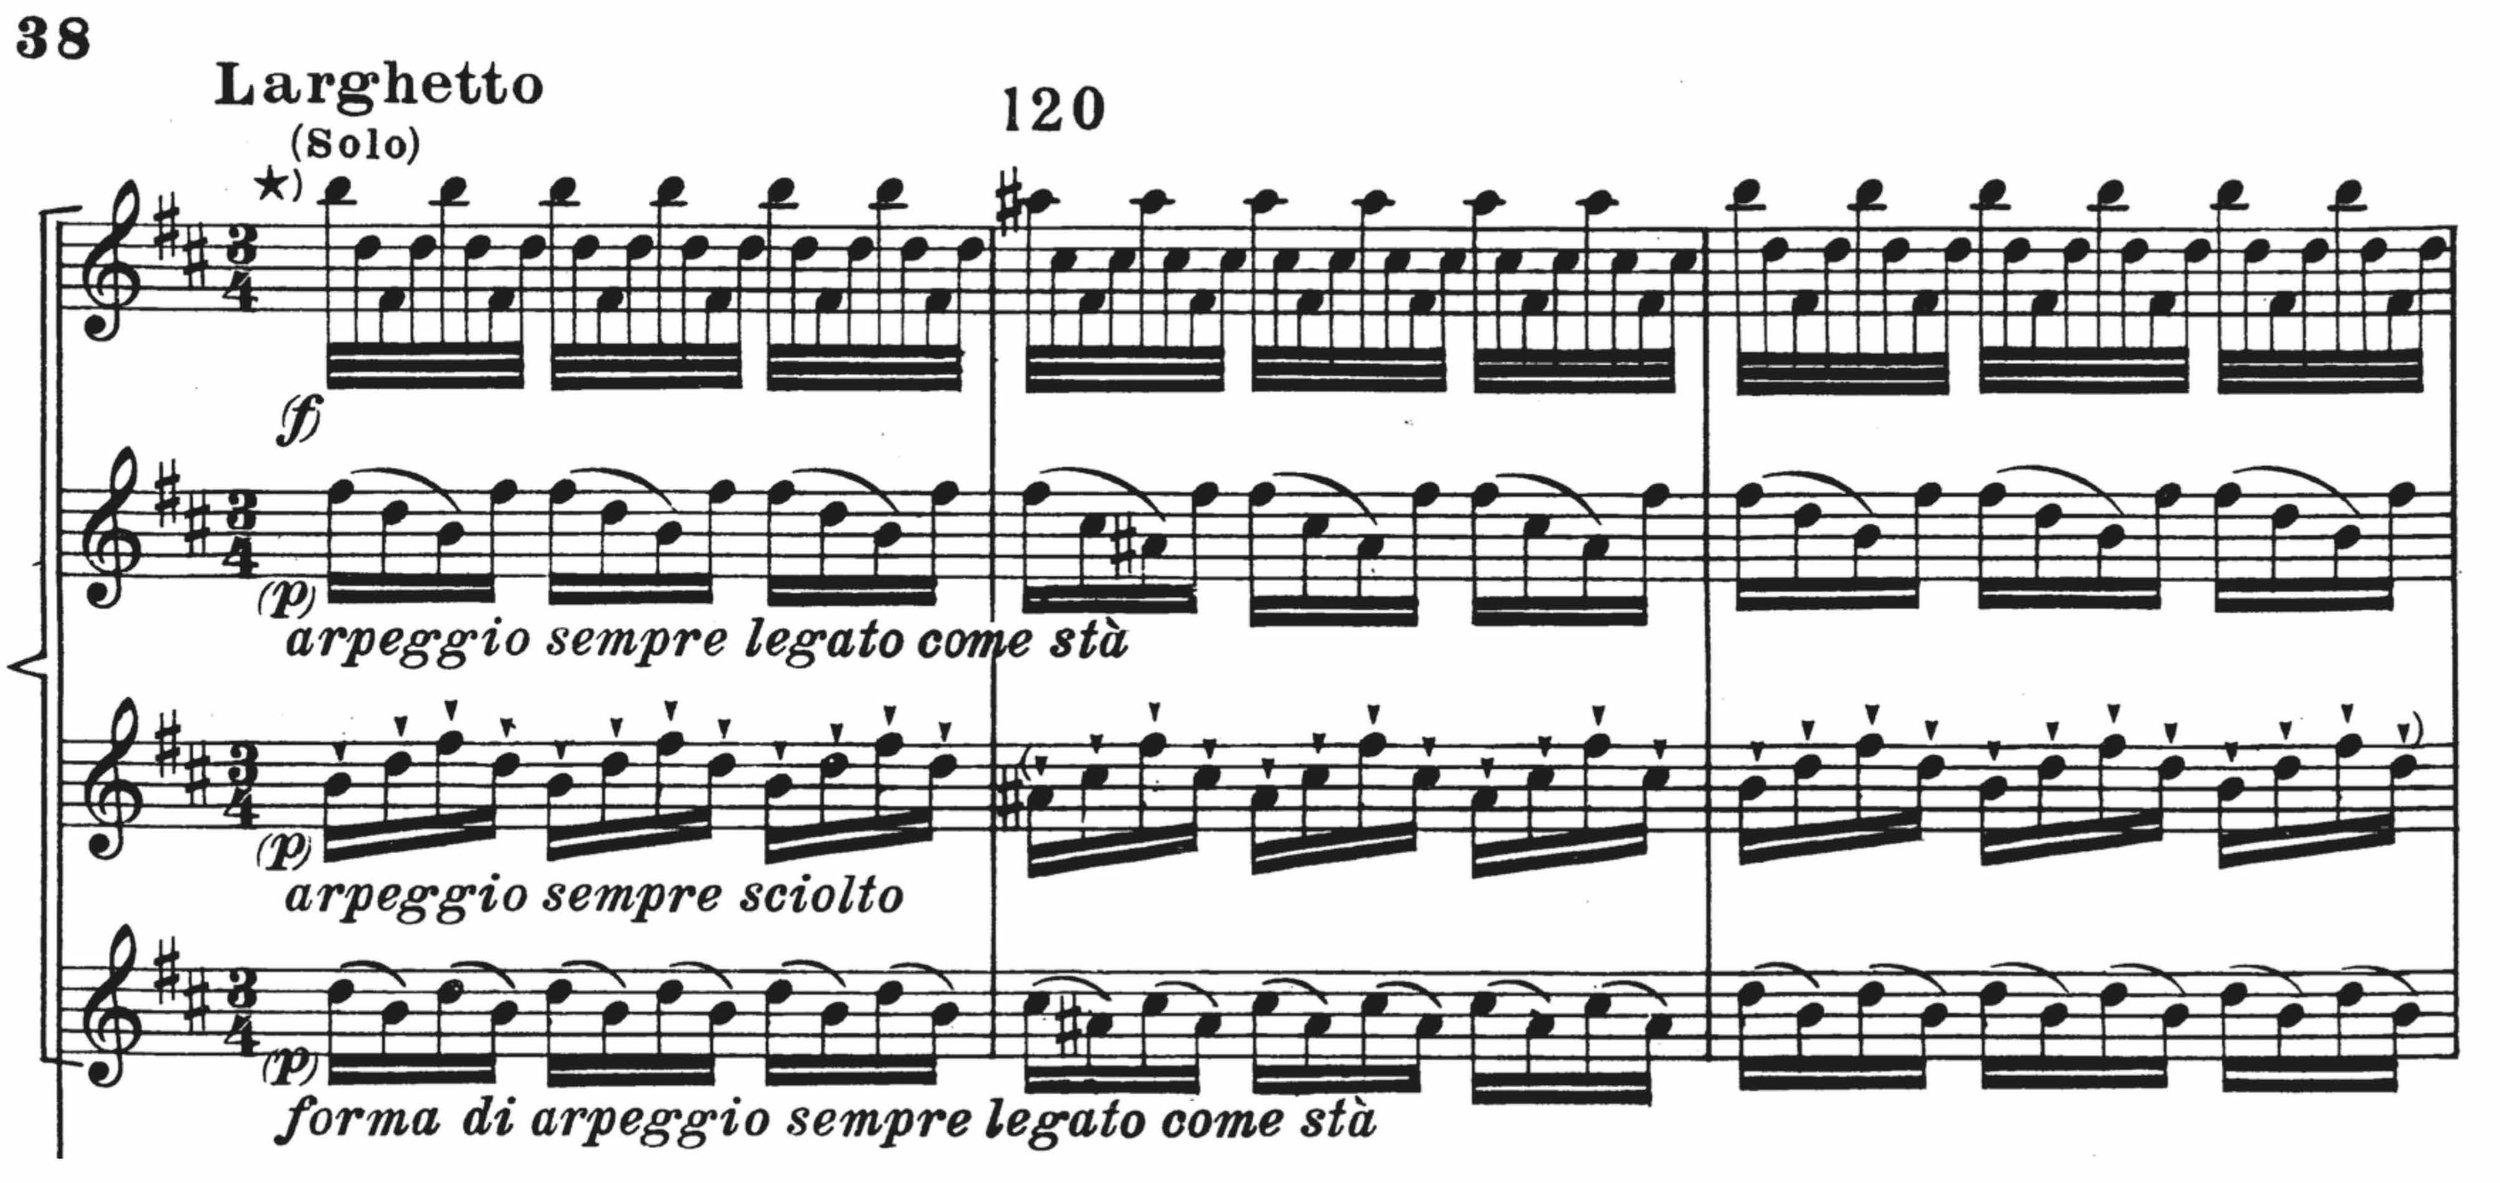 Figure 2. Vivaldi,  L'estro armonico,  Op. 3, No. 10; II. Largo-Larghetto,  concertanti  (violin soloists), mm. 119-121.